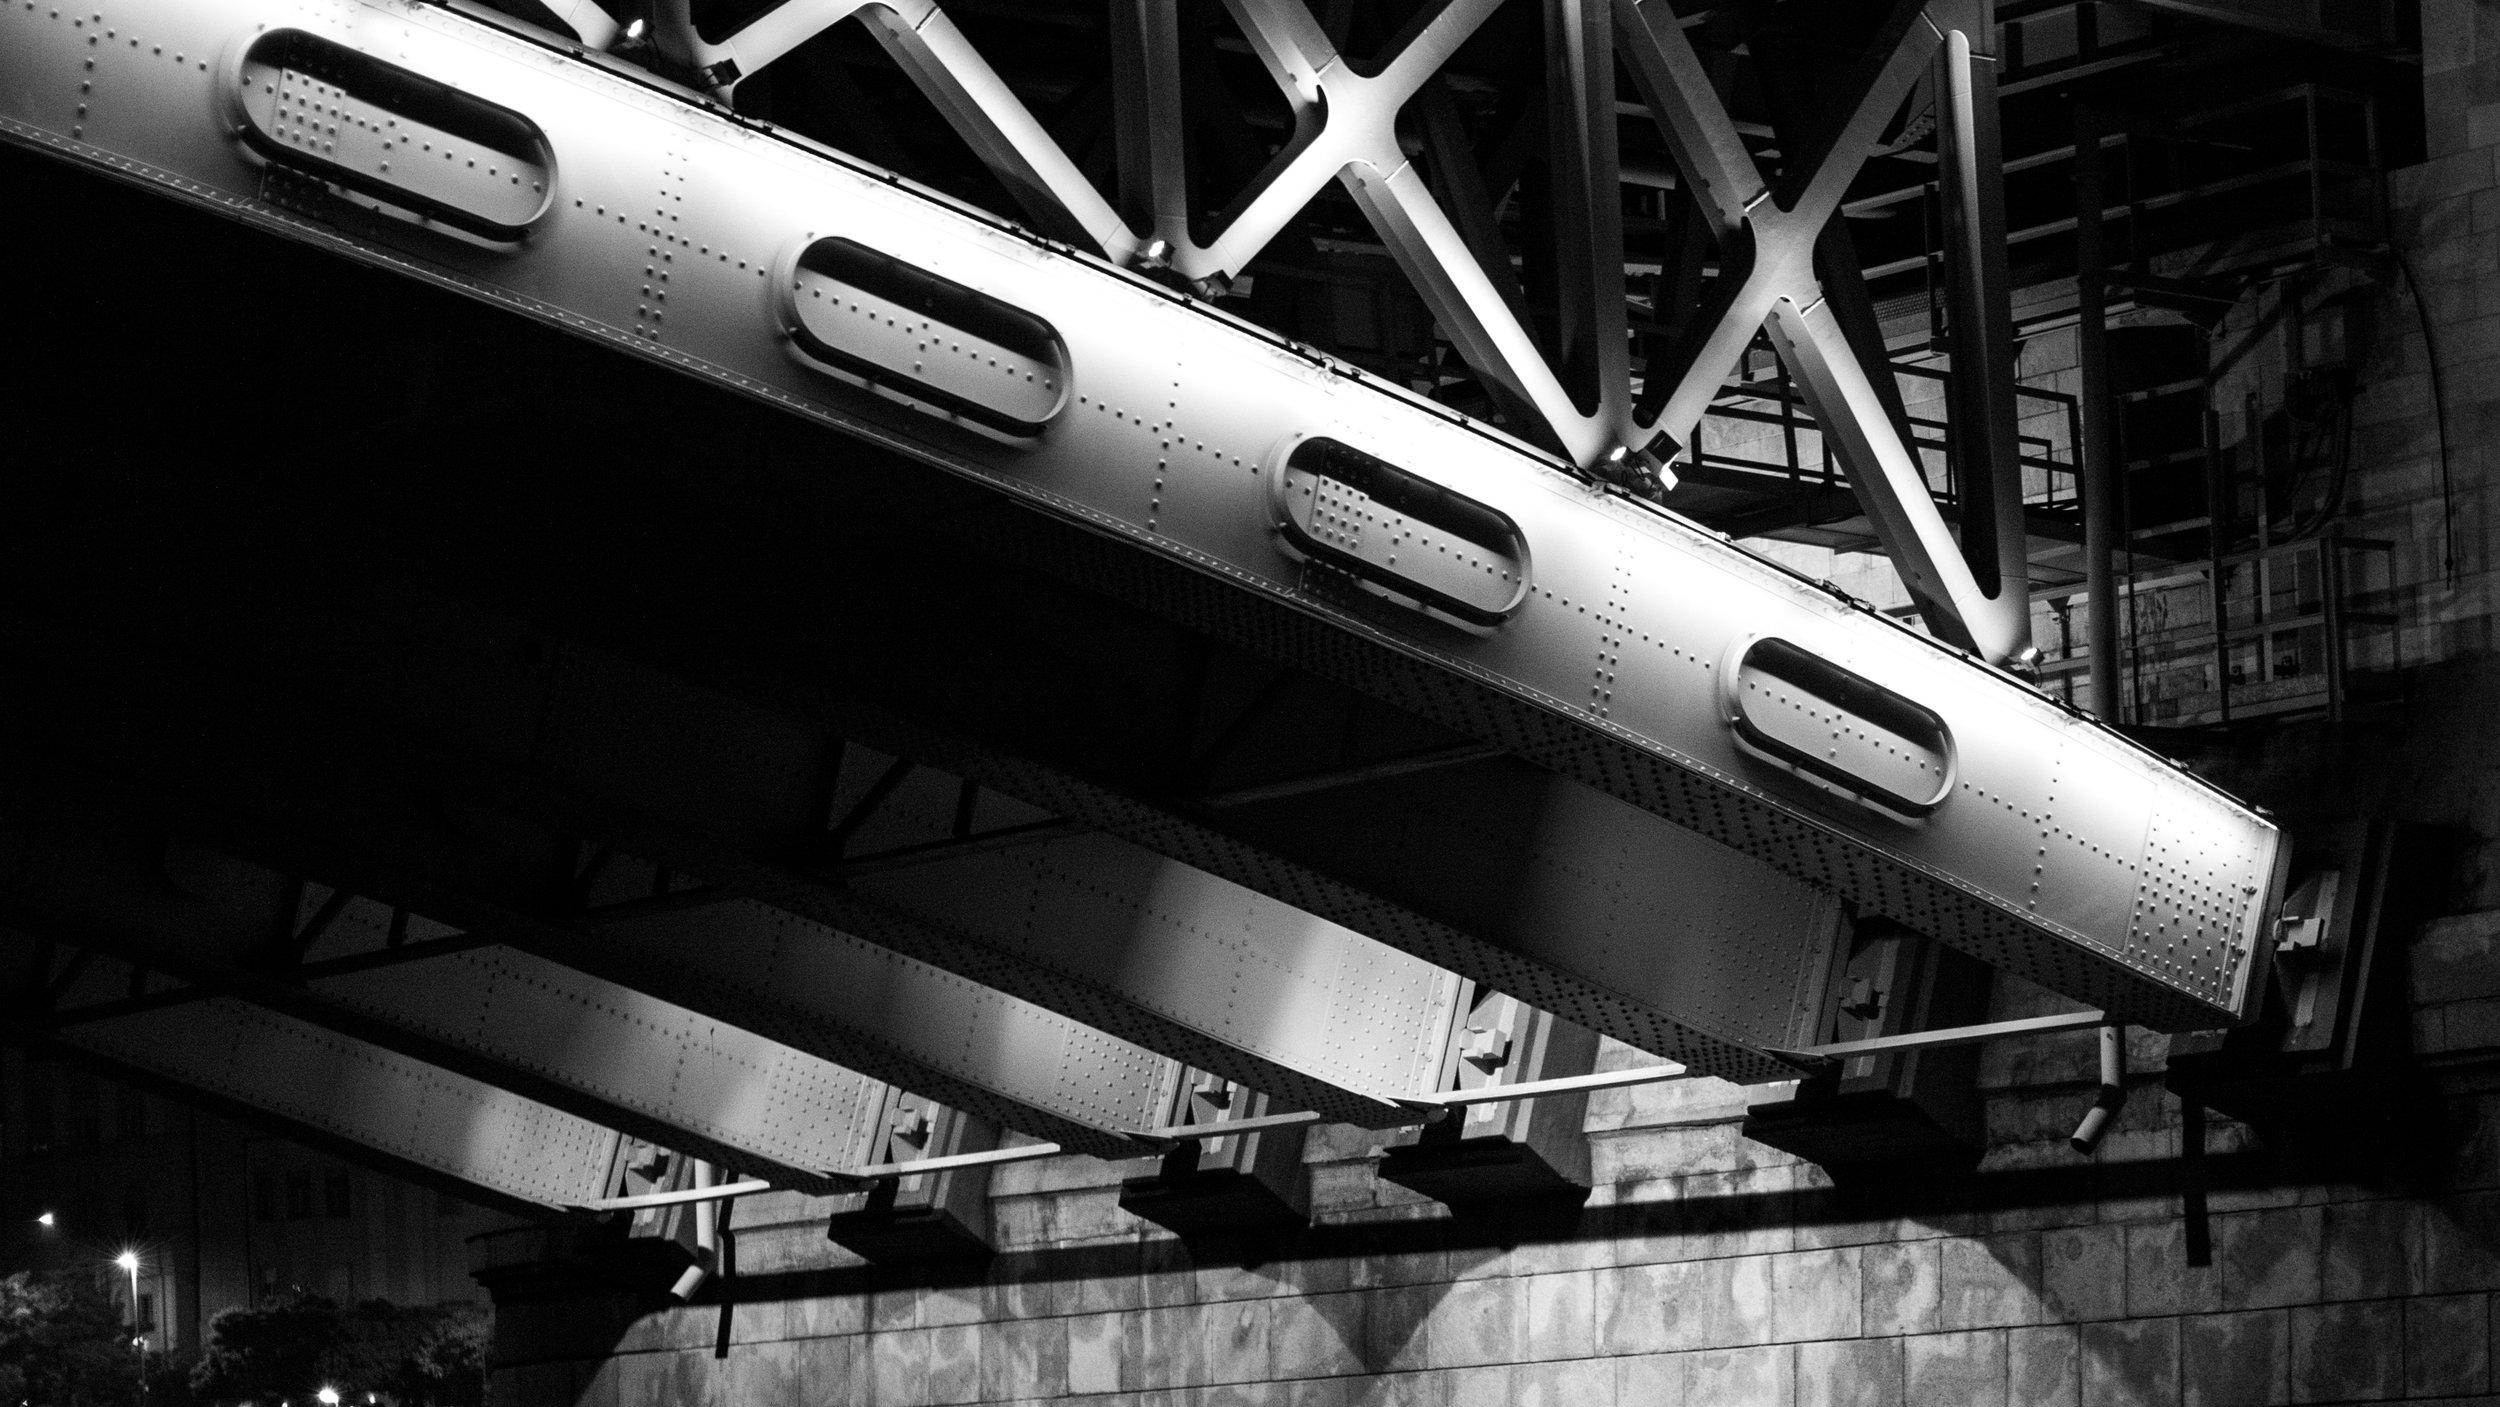 Bridge struts in Budapest, Hungary